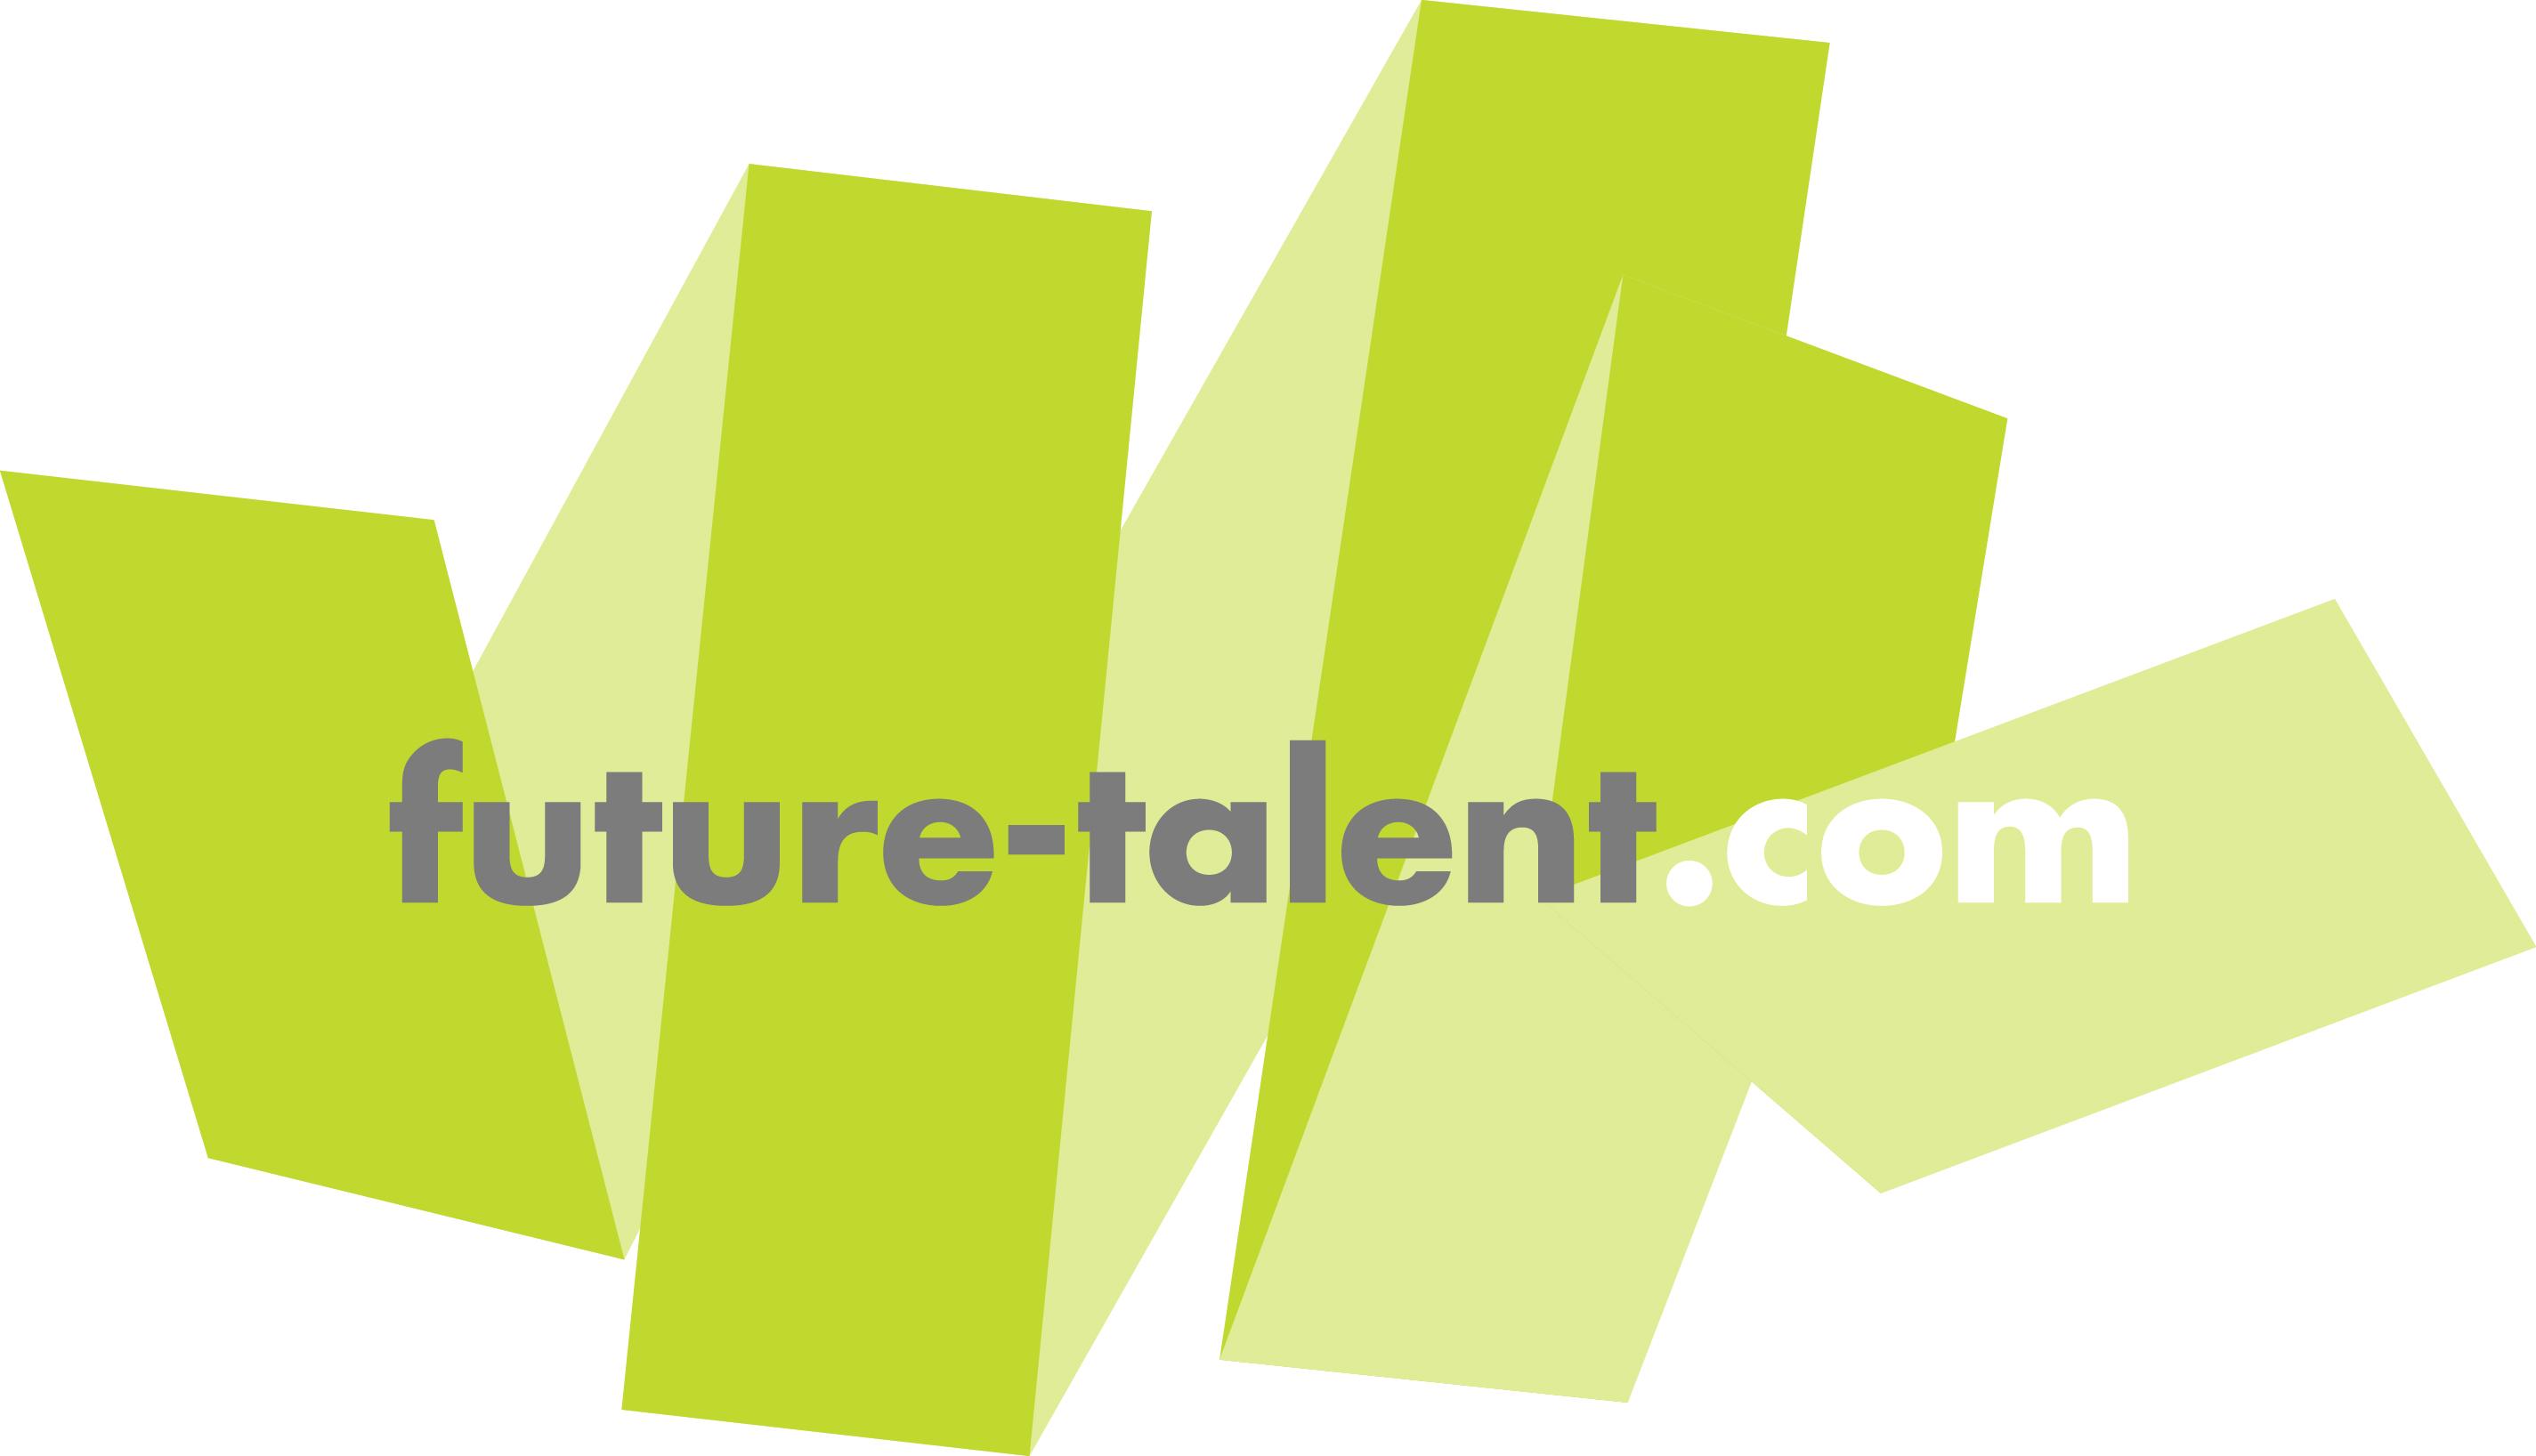 Future-Talent renews YEUK Membership!